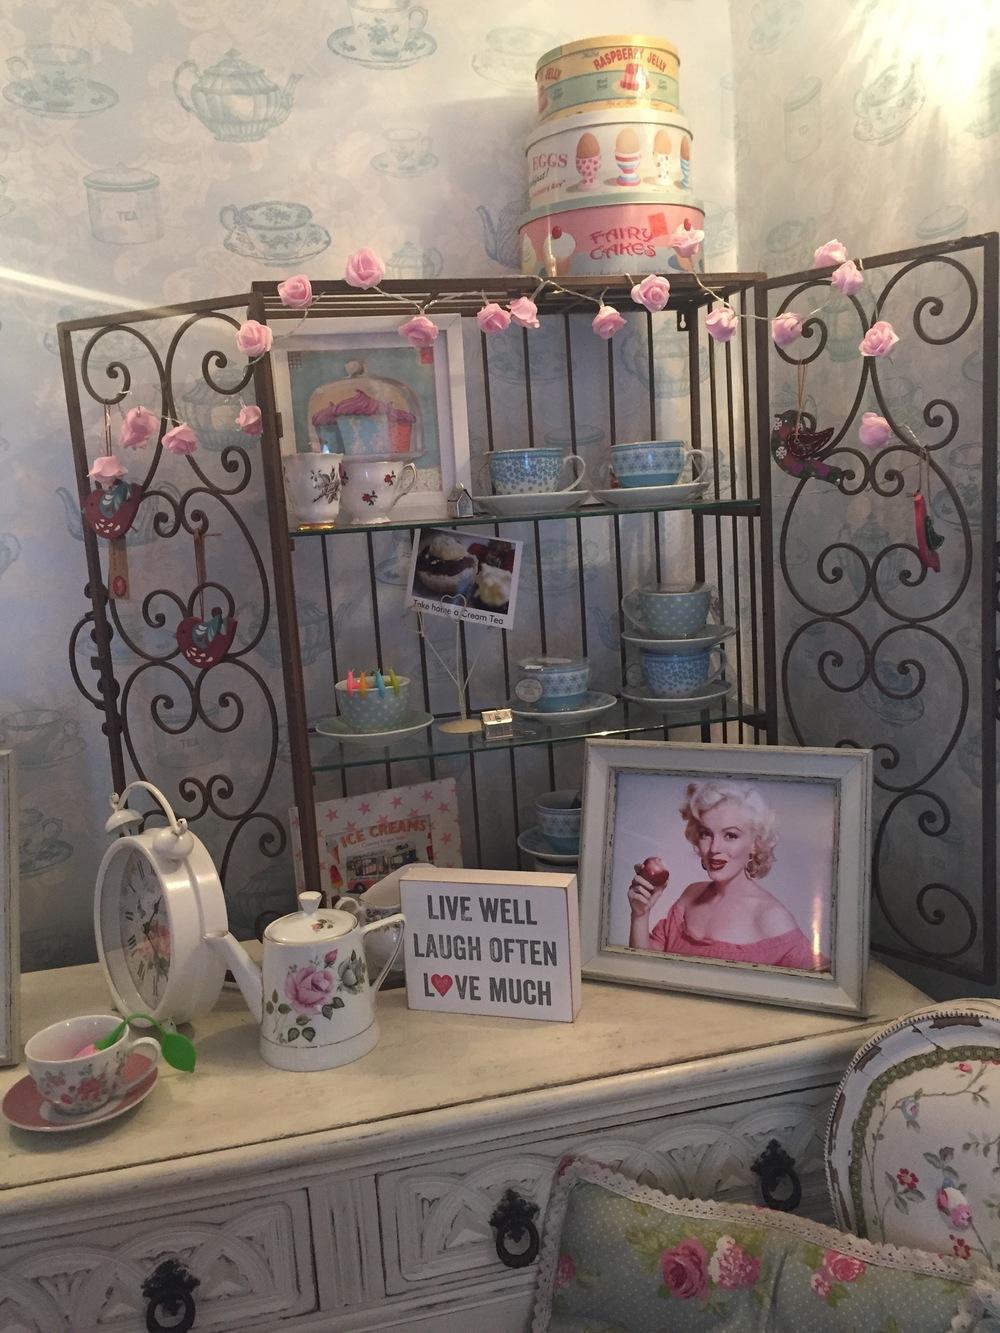 Cheddar Tea Rooms Decor: Shabby Chic Room